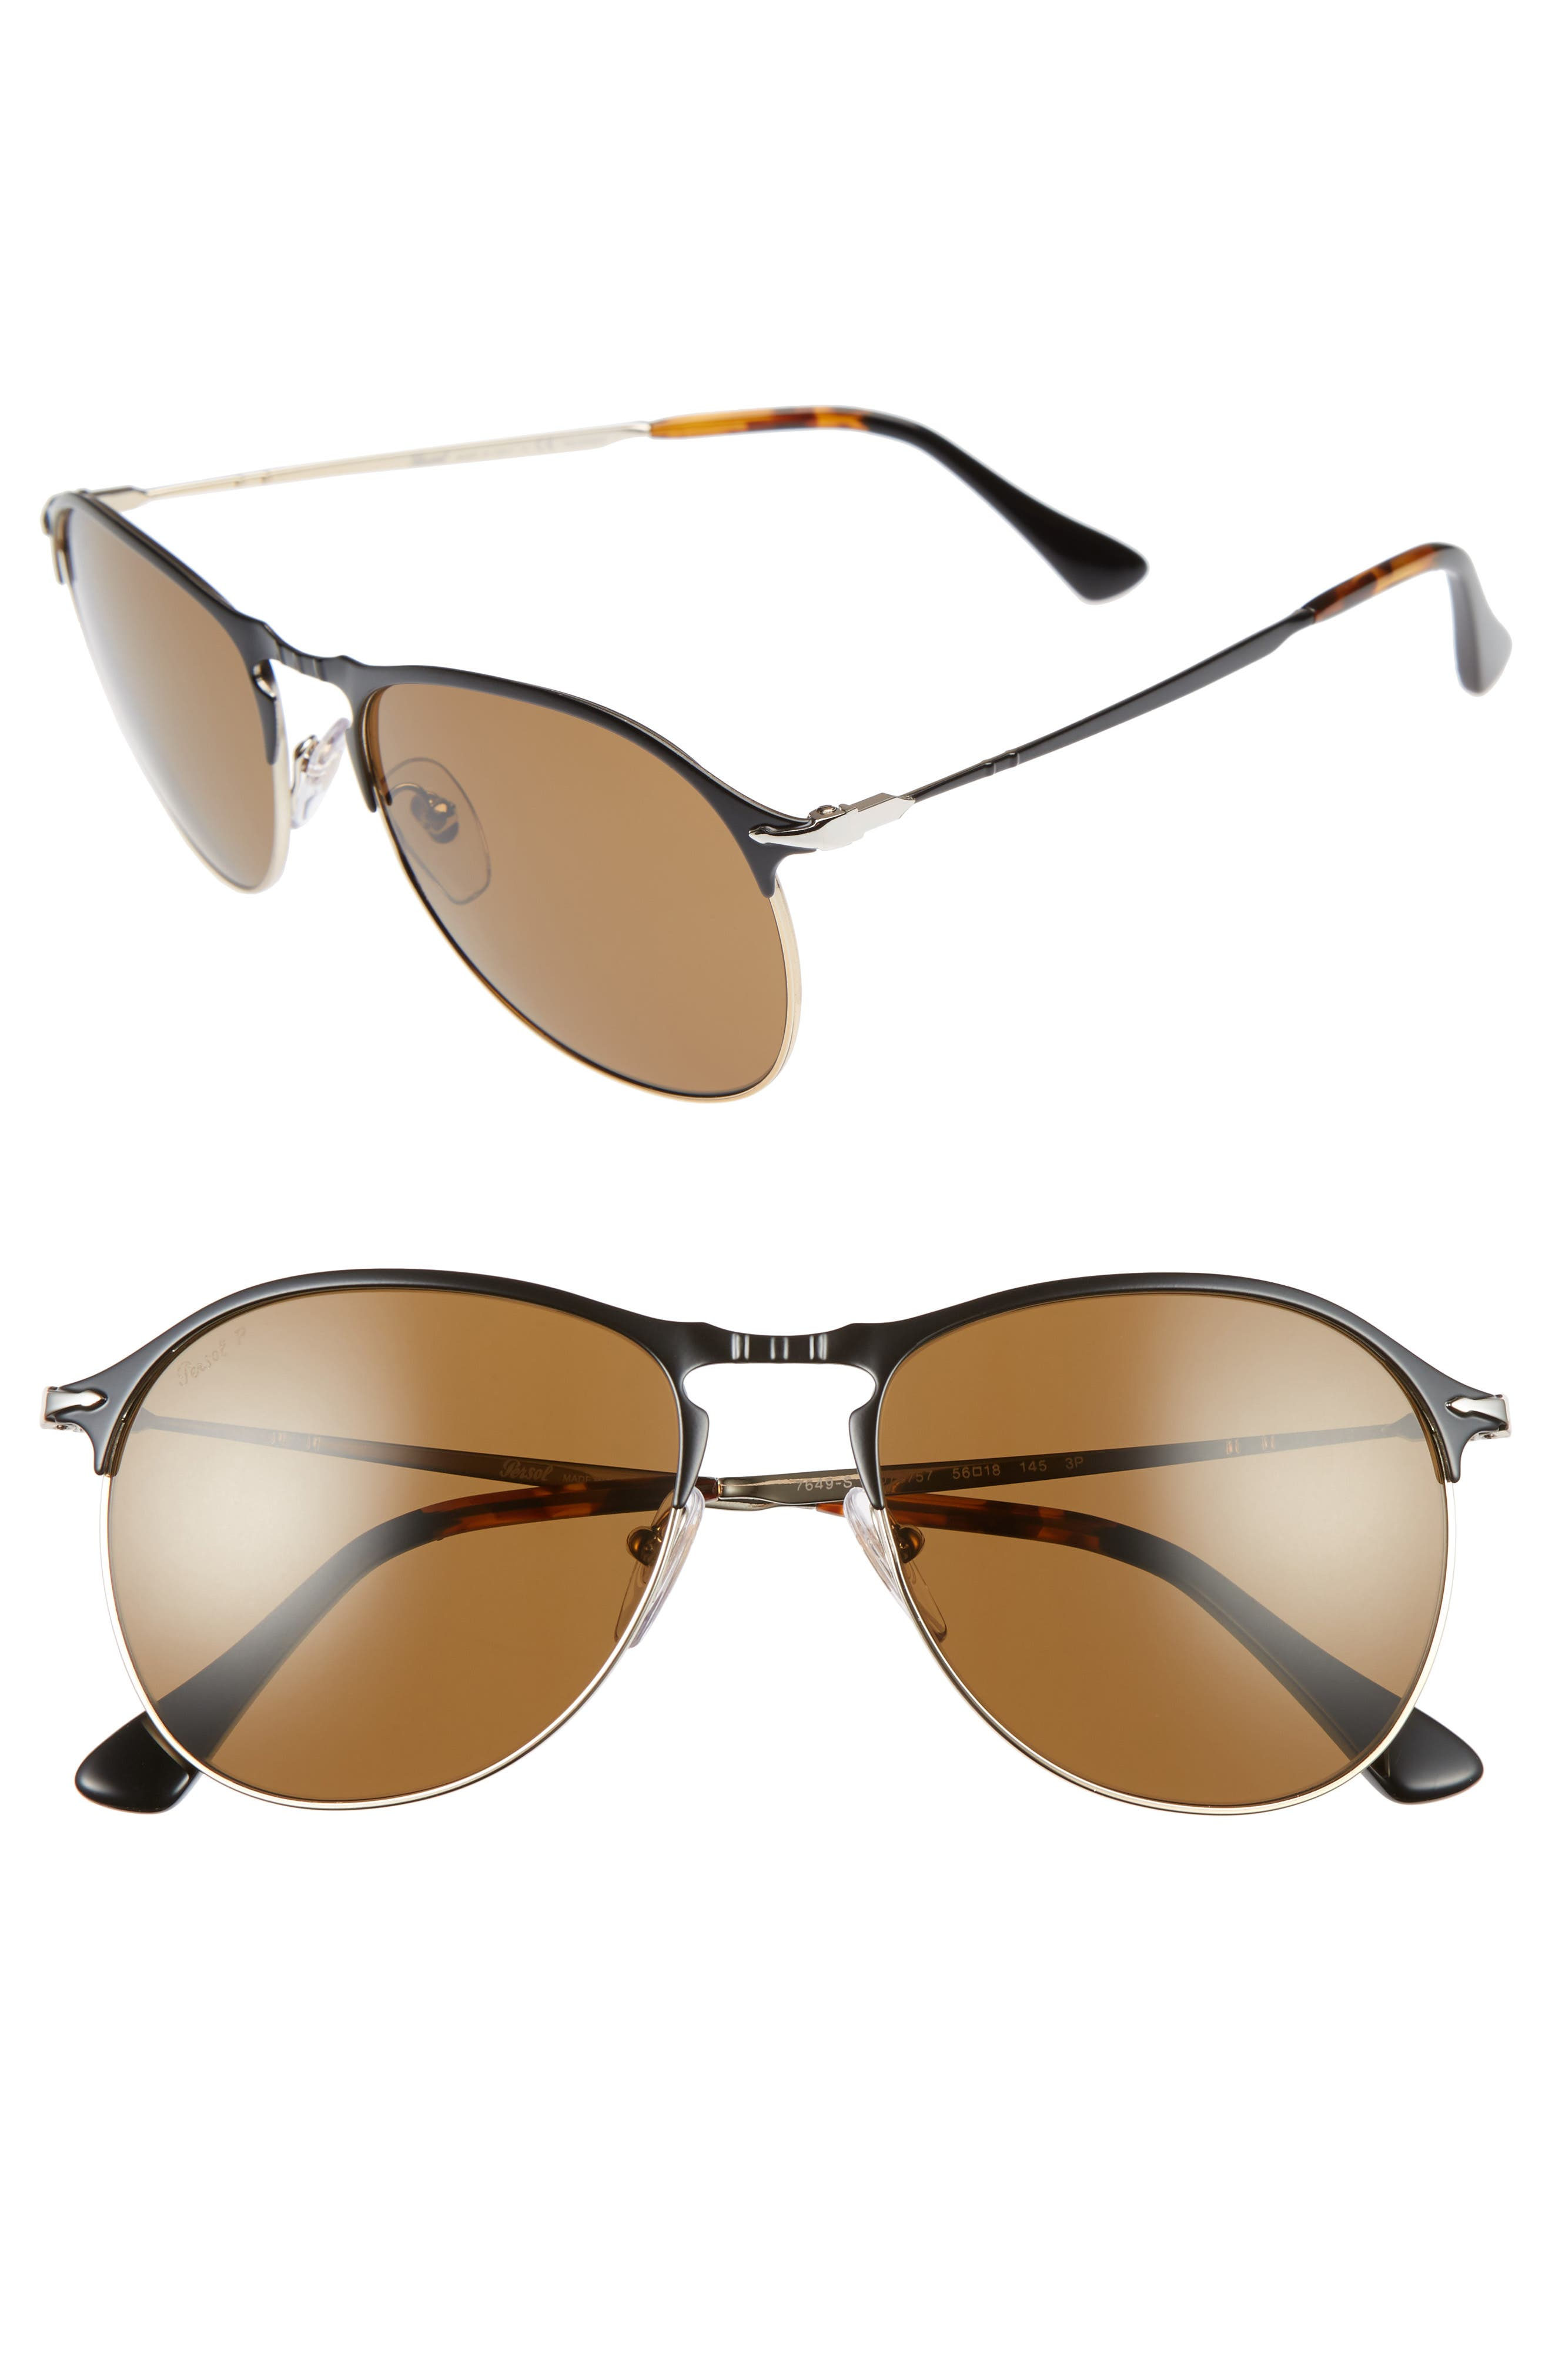 Sartoria 56mm Polarized Aviator Sunglasses,                             Main thumbnail 1, color,                             MATTE BLACK